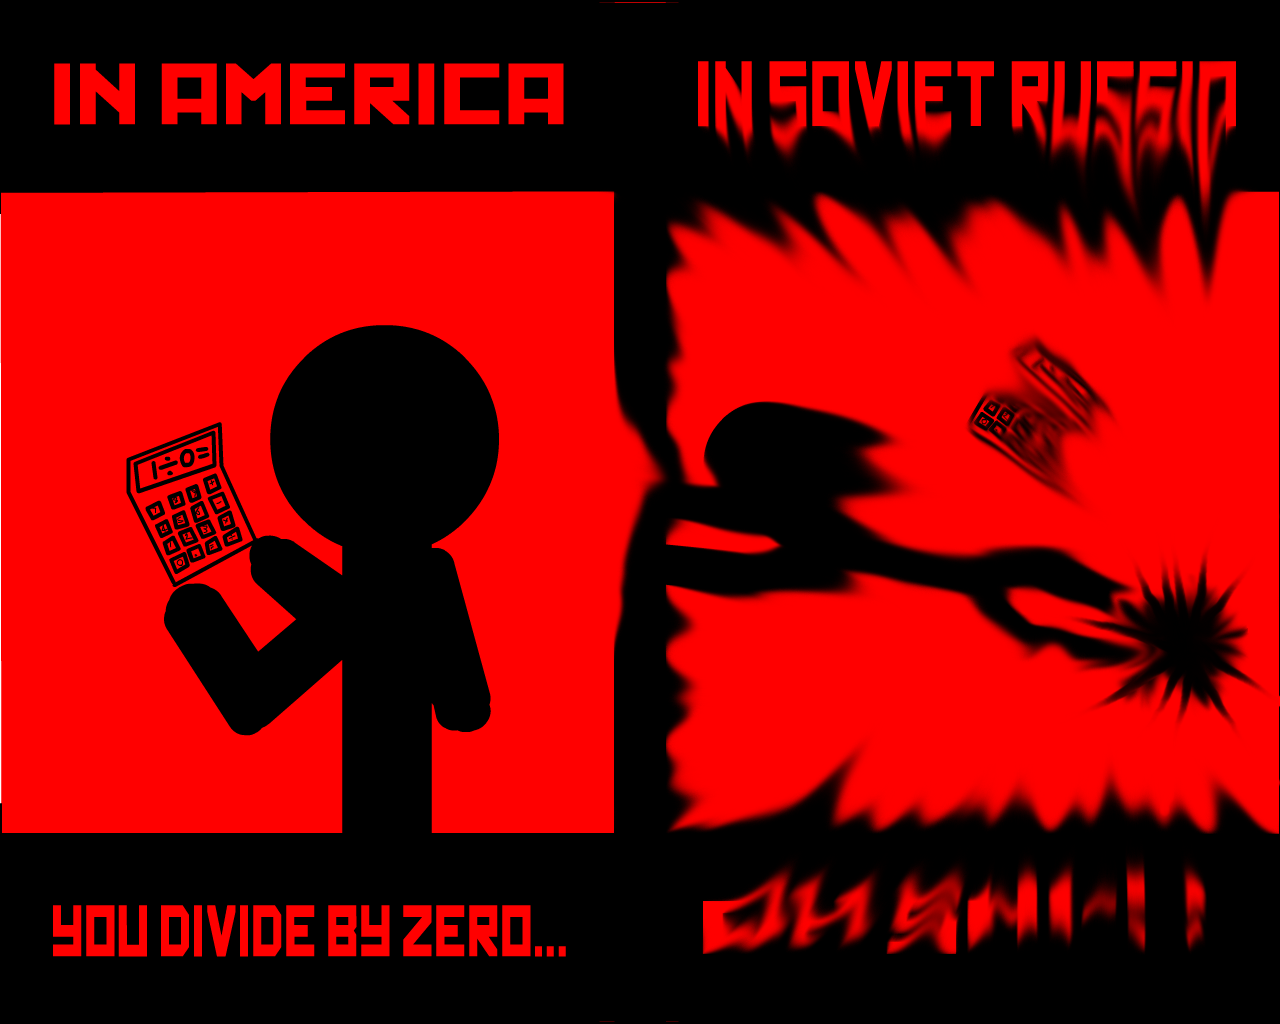 ISR: Dividing by zero by RainbowJerk